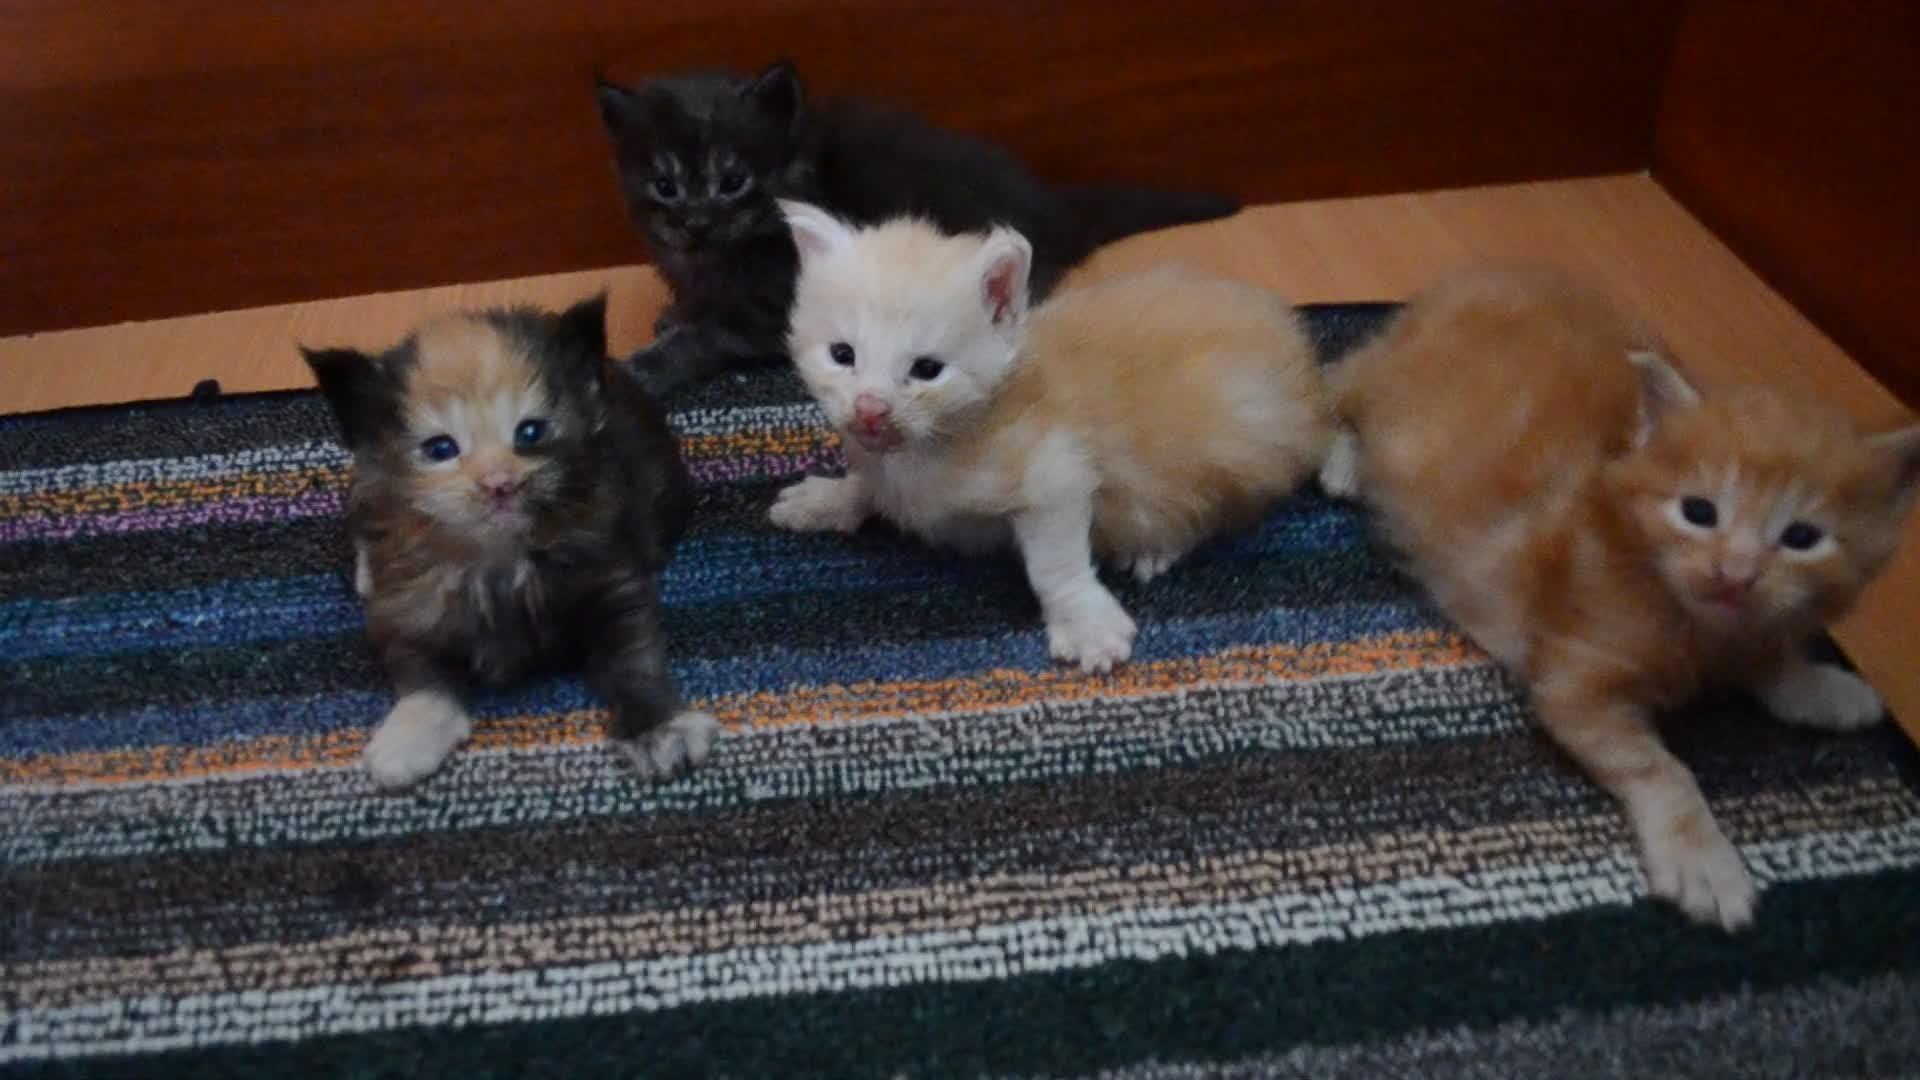 Cute kittens, dog, Cute kittens GIFs